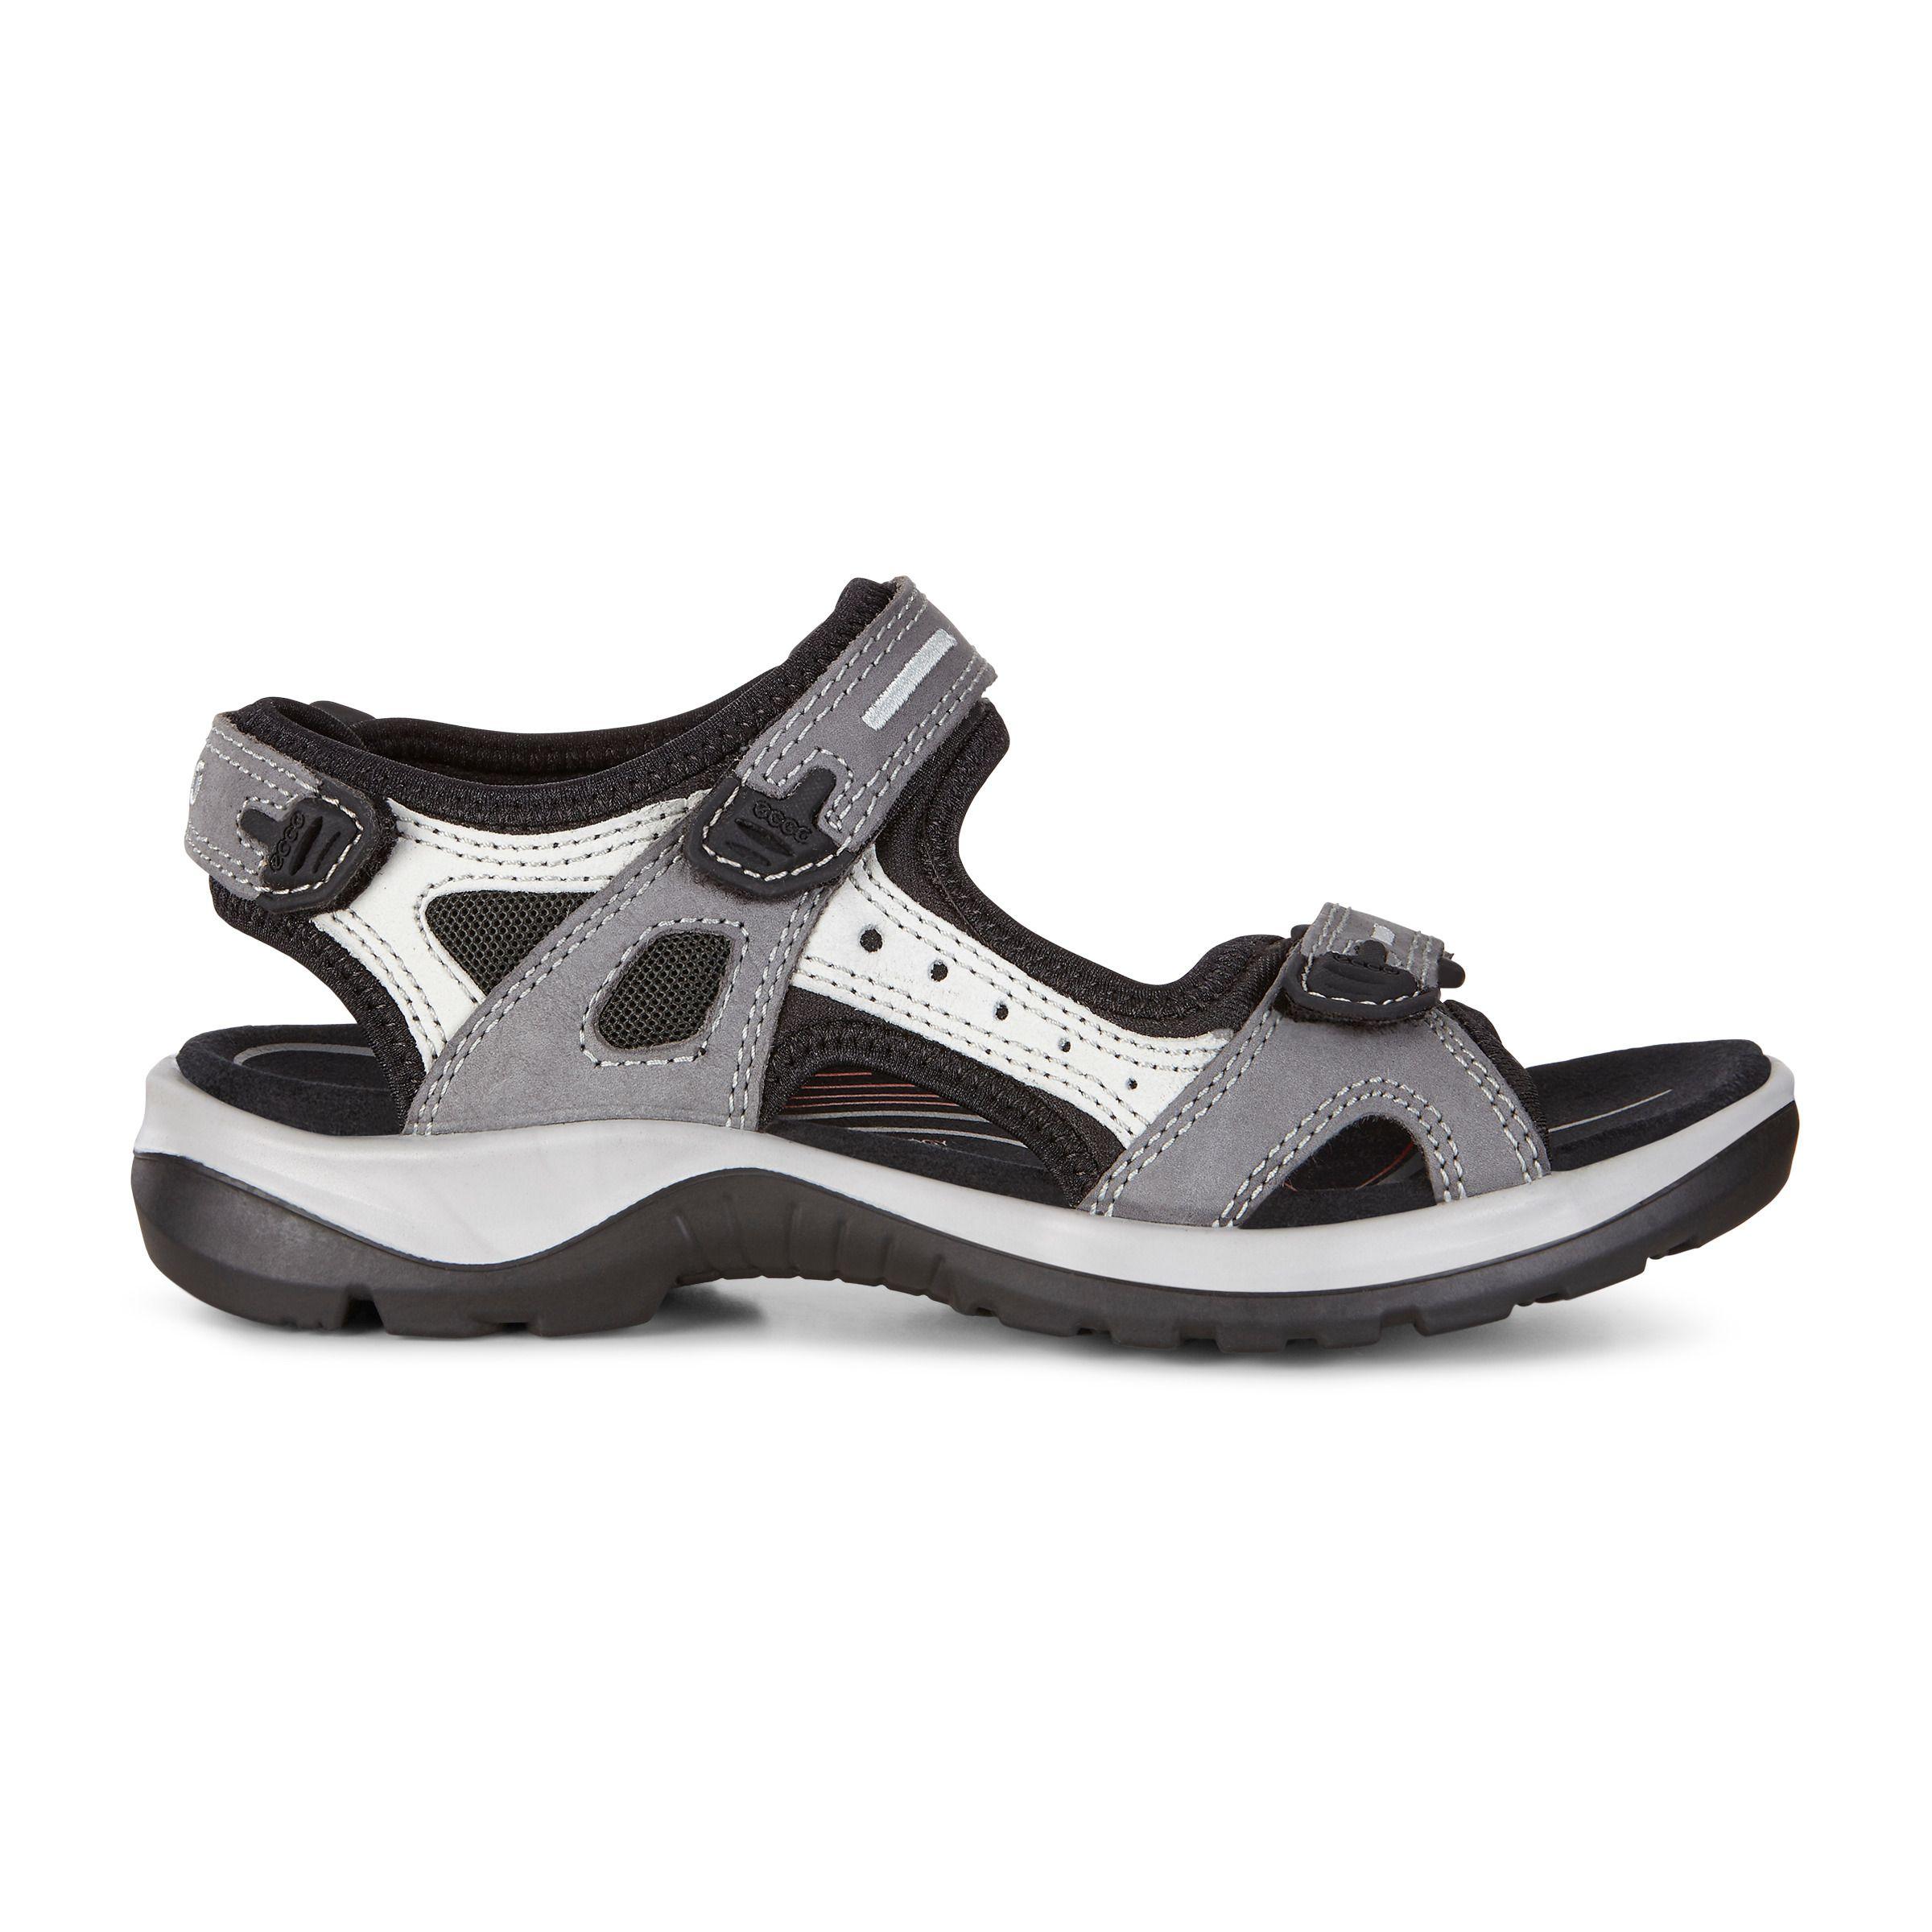 Ecco Receptor Sandals US 8 EU 38 Brown